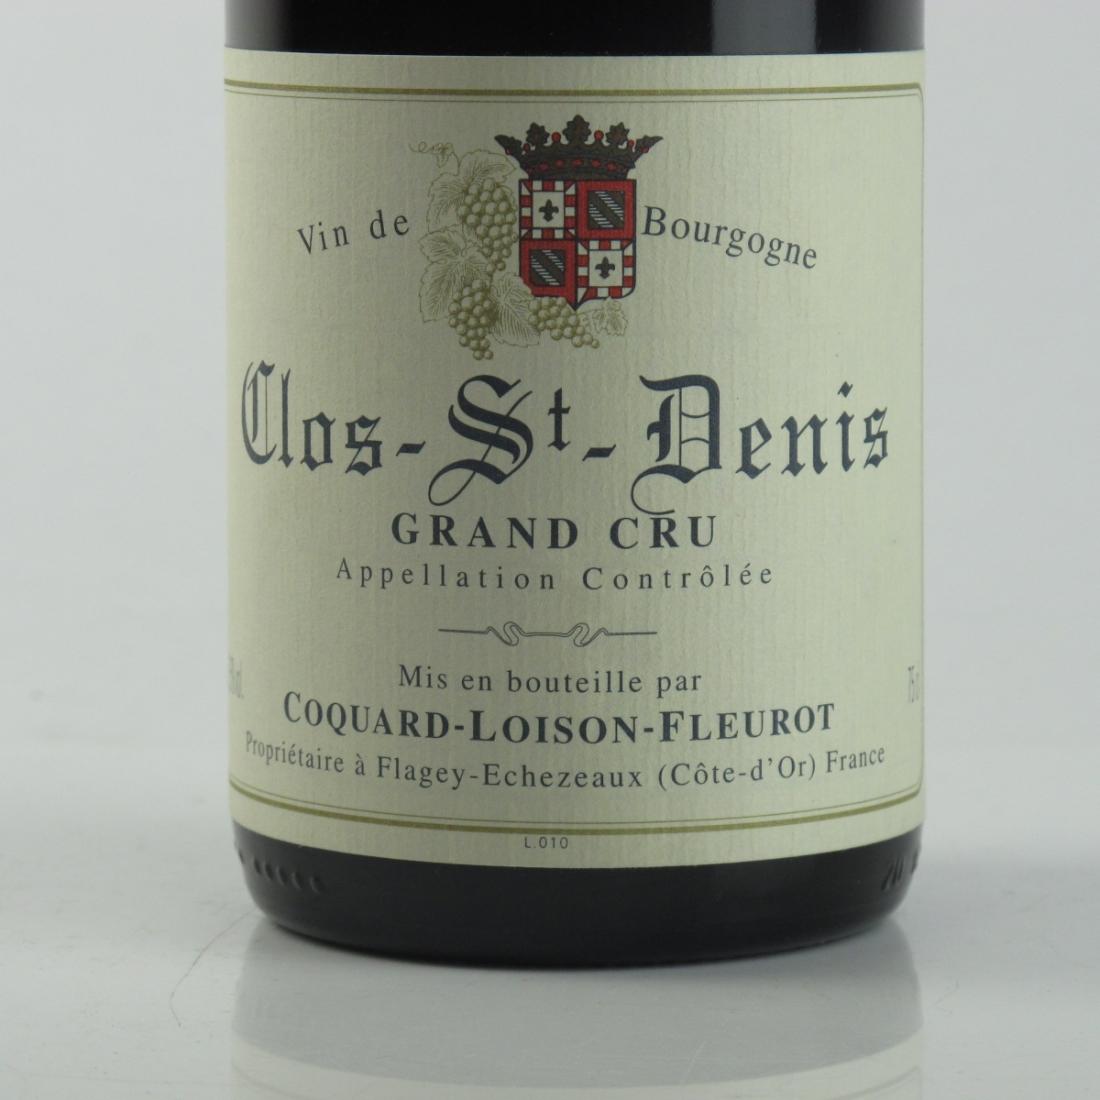 C.L.Fleurot 2001 Clos-St-Denis Grand-Cru